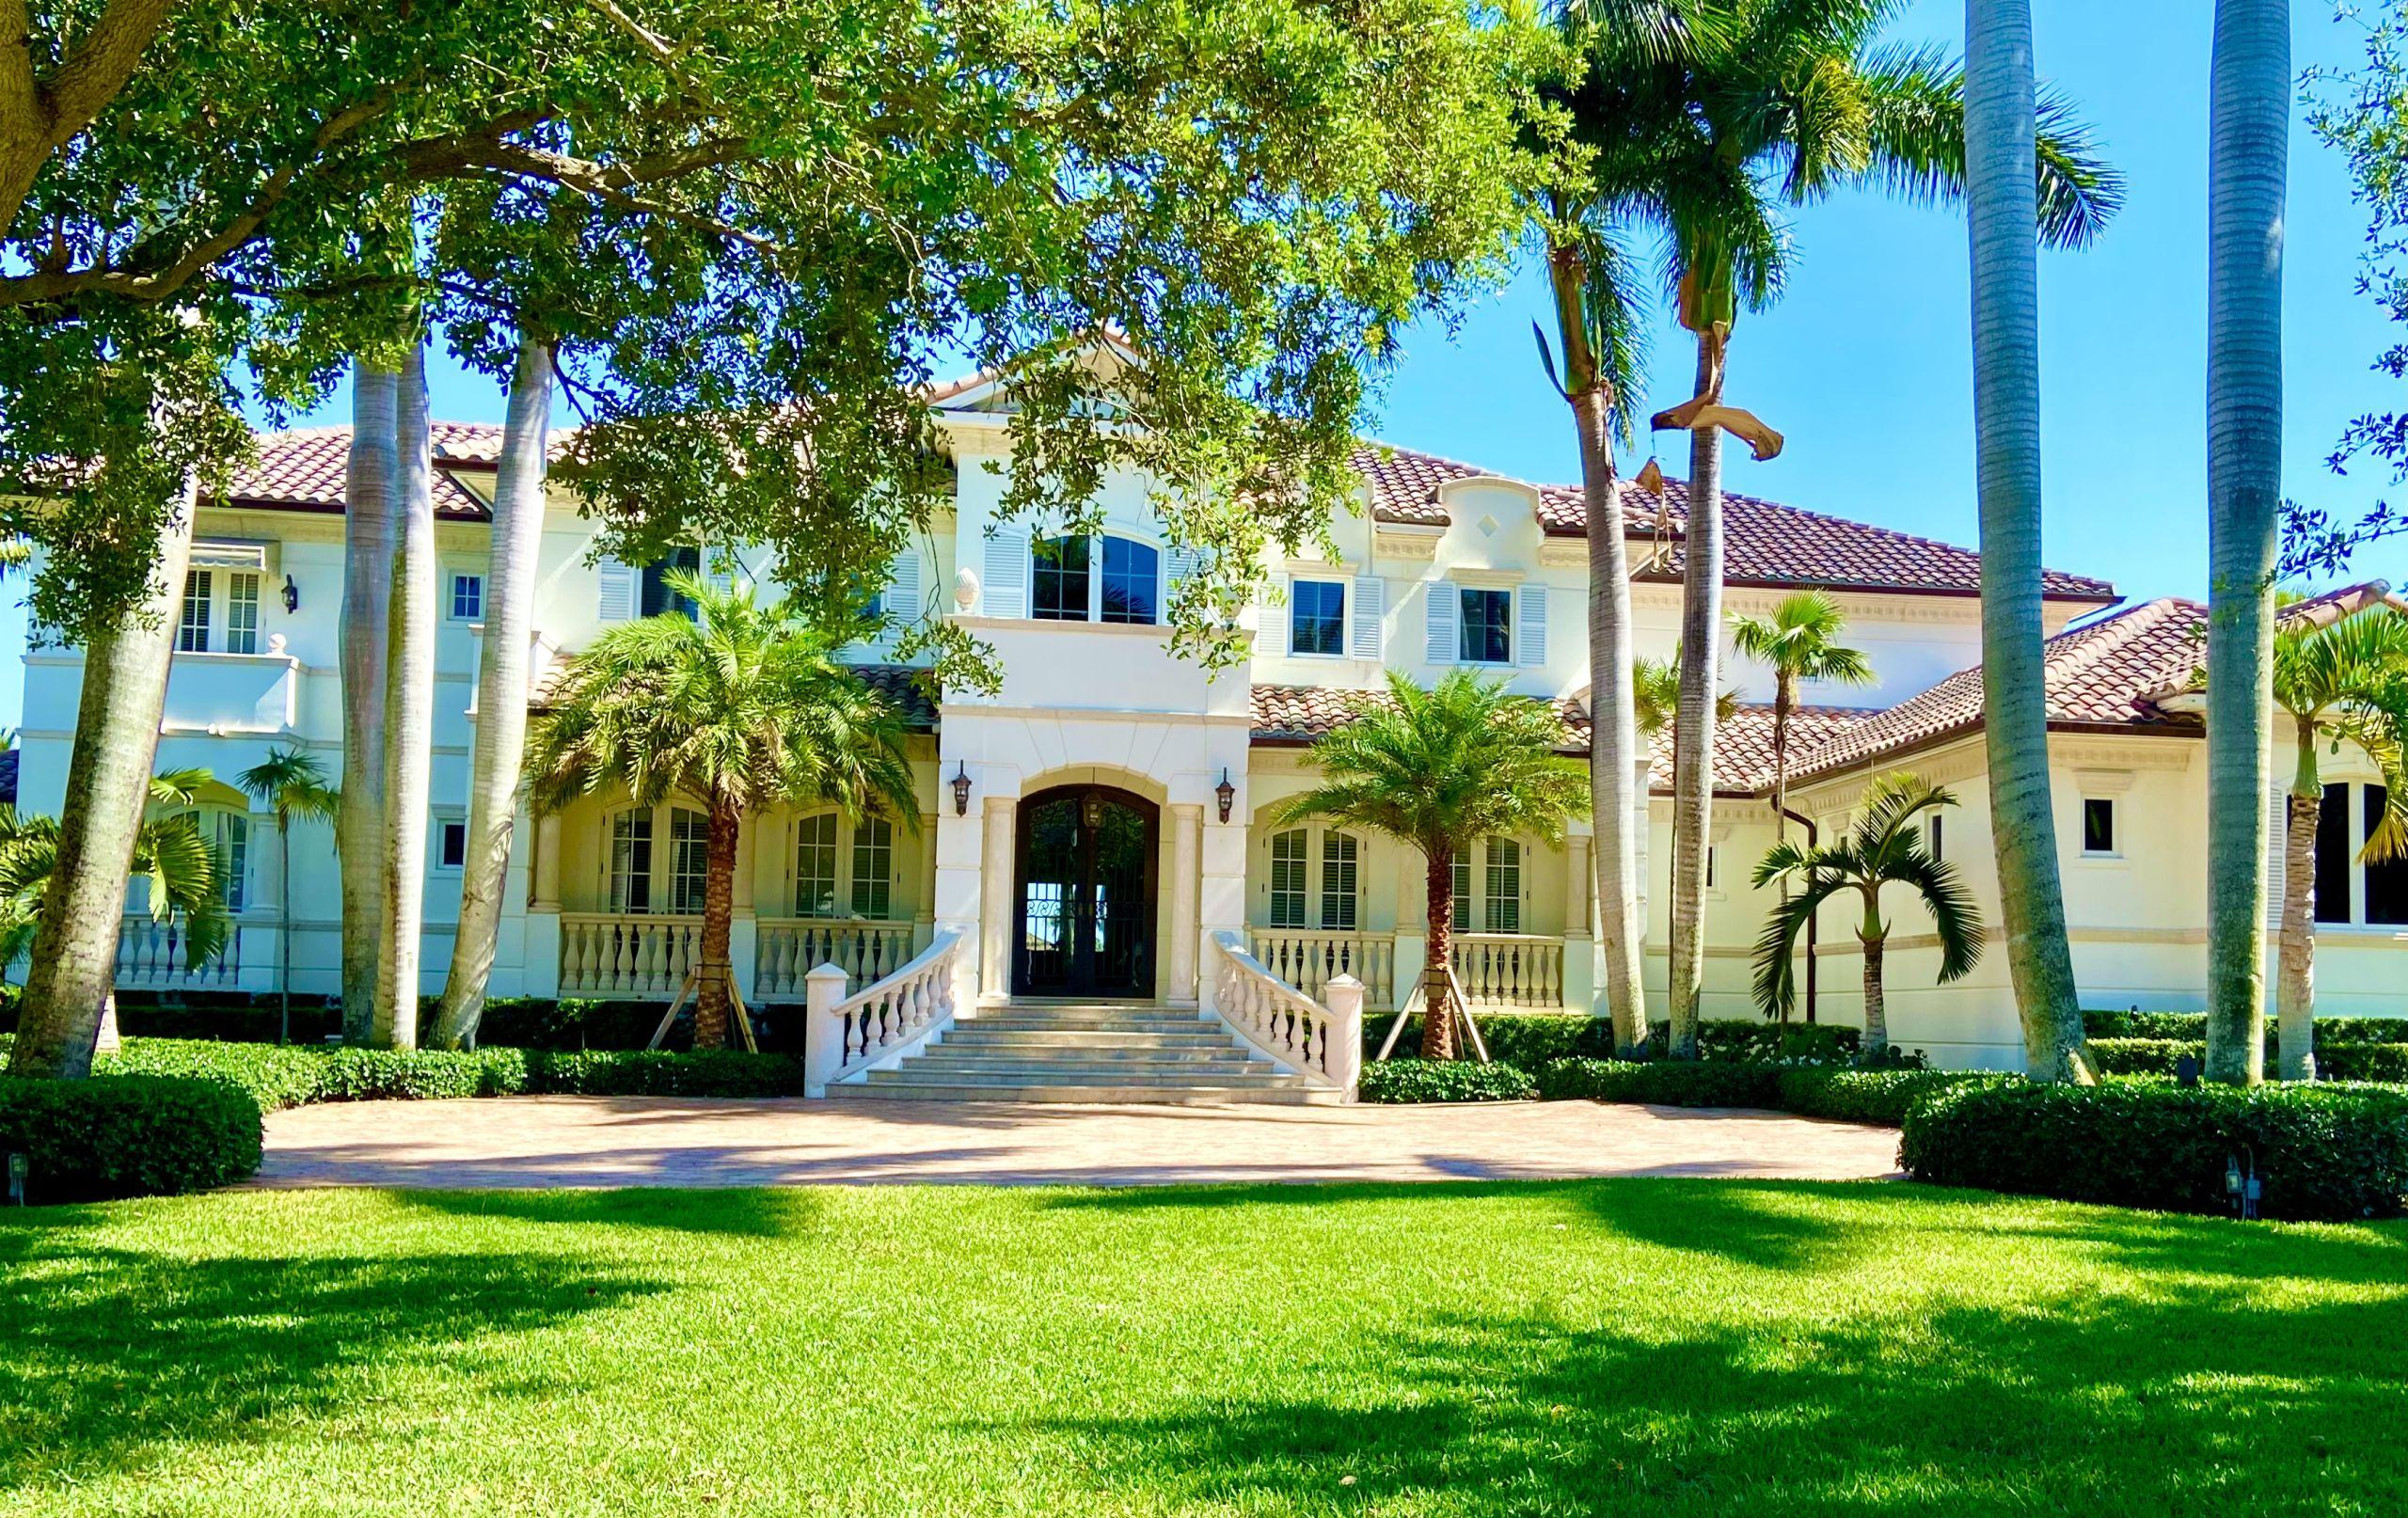 Deerwood Bonita Villas Townhome – Under contract